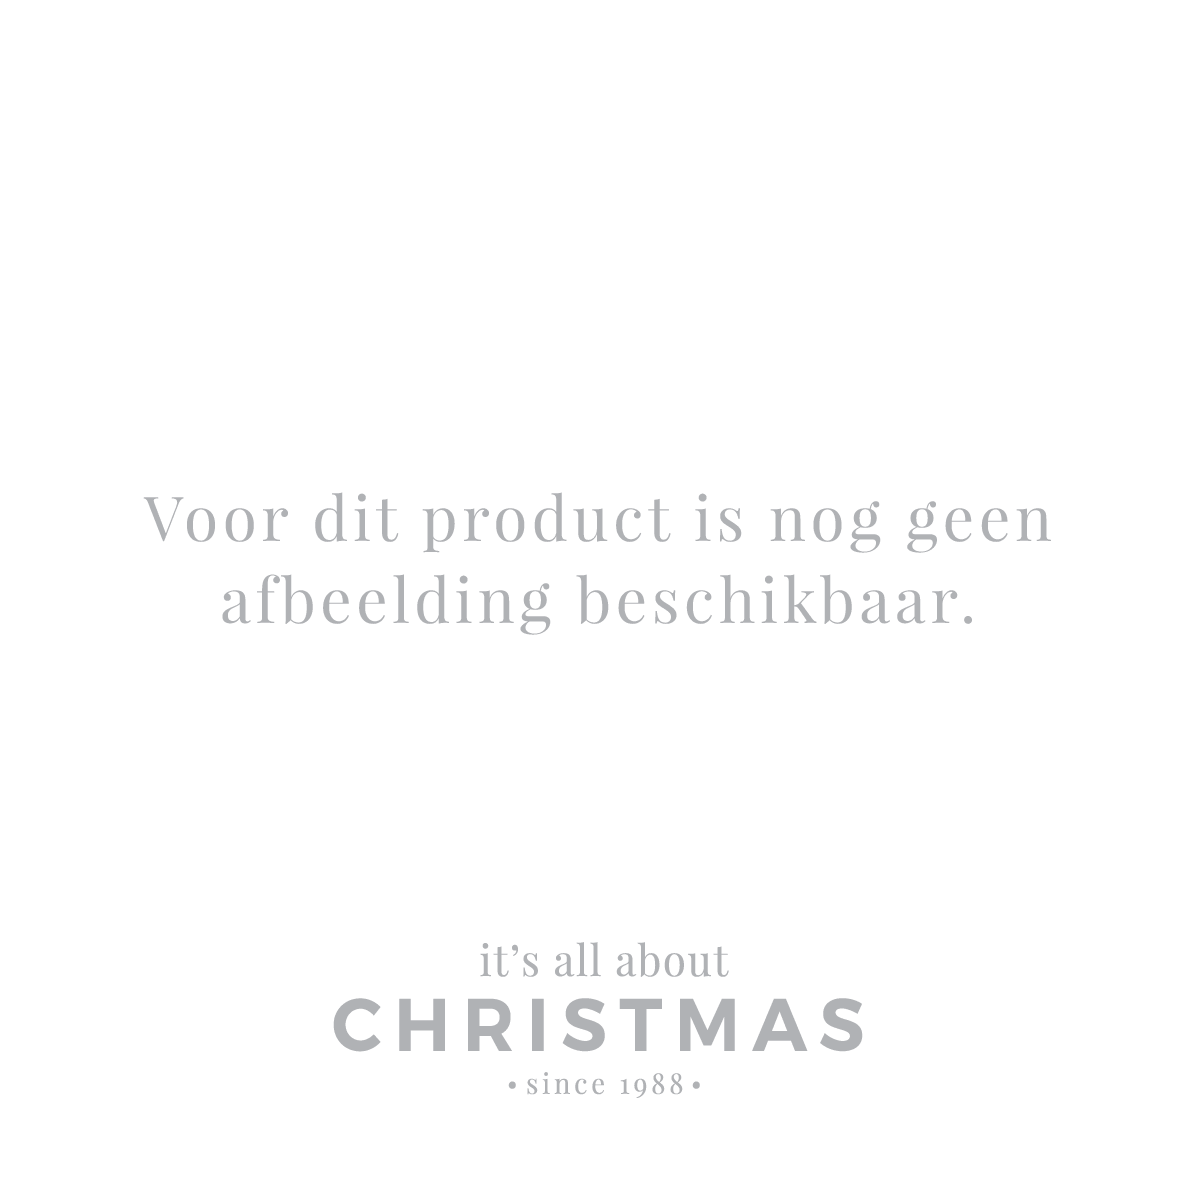 Christbaumkugeln Champagner Glas.Christbaumkugel Champagner M Blumenzweigen It S All About Christmas